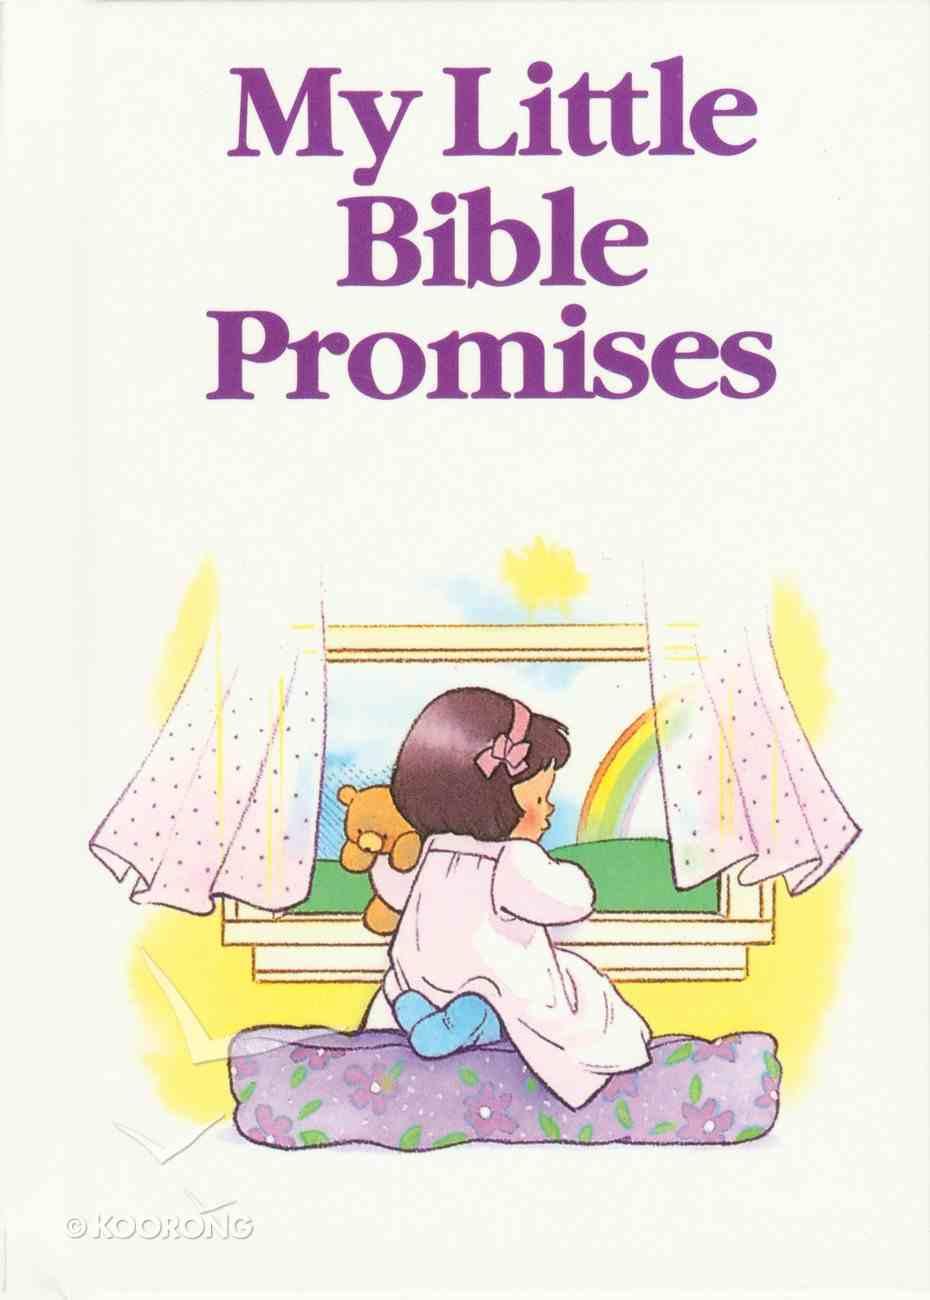 My Little Bible Promises (My Little Bible Series) eBook